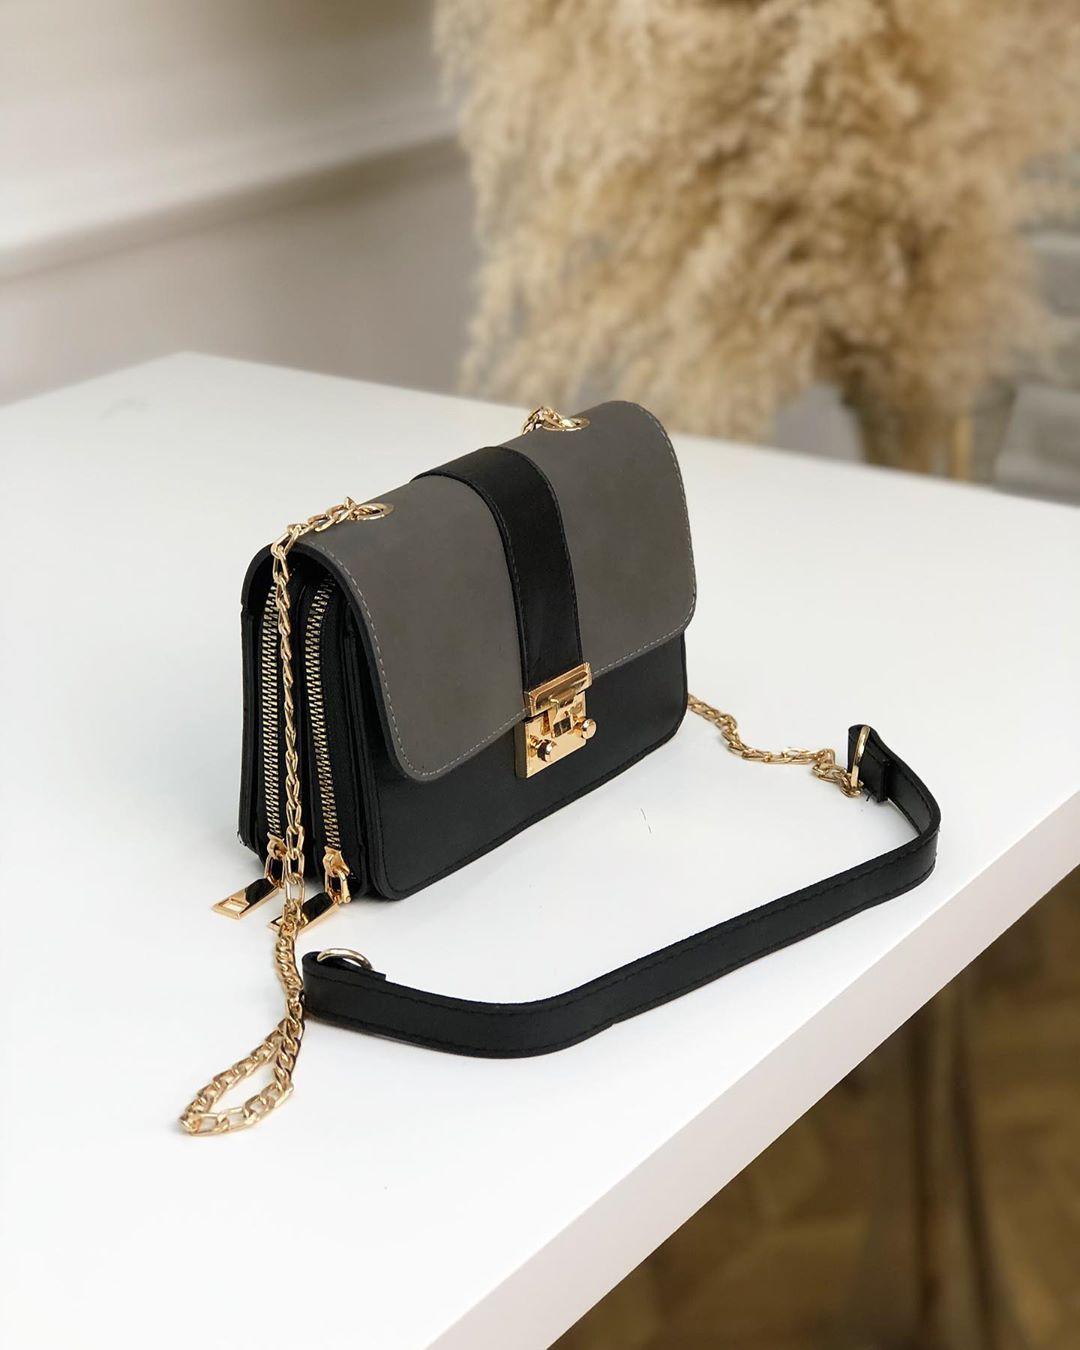 2 633 Begenme 109 Yorum Instagram Da Shule Bags Canta Ayakkabi Shulebags Carla Yeni Renkler Eklendi In 2020 Bags Crossbody Wristlet